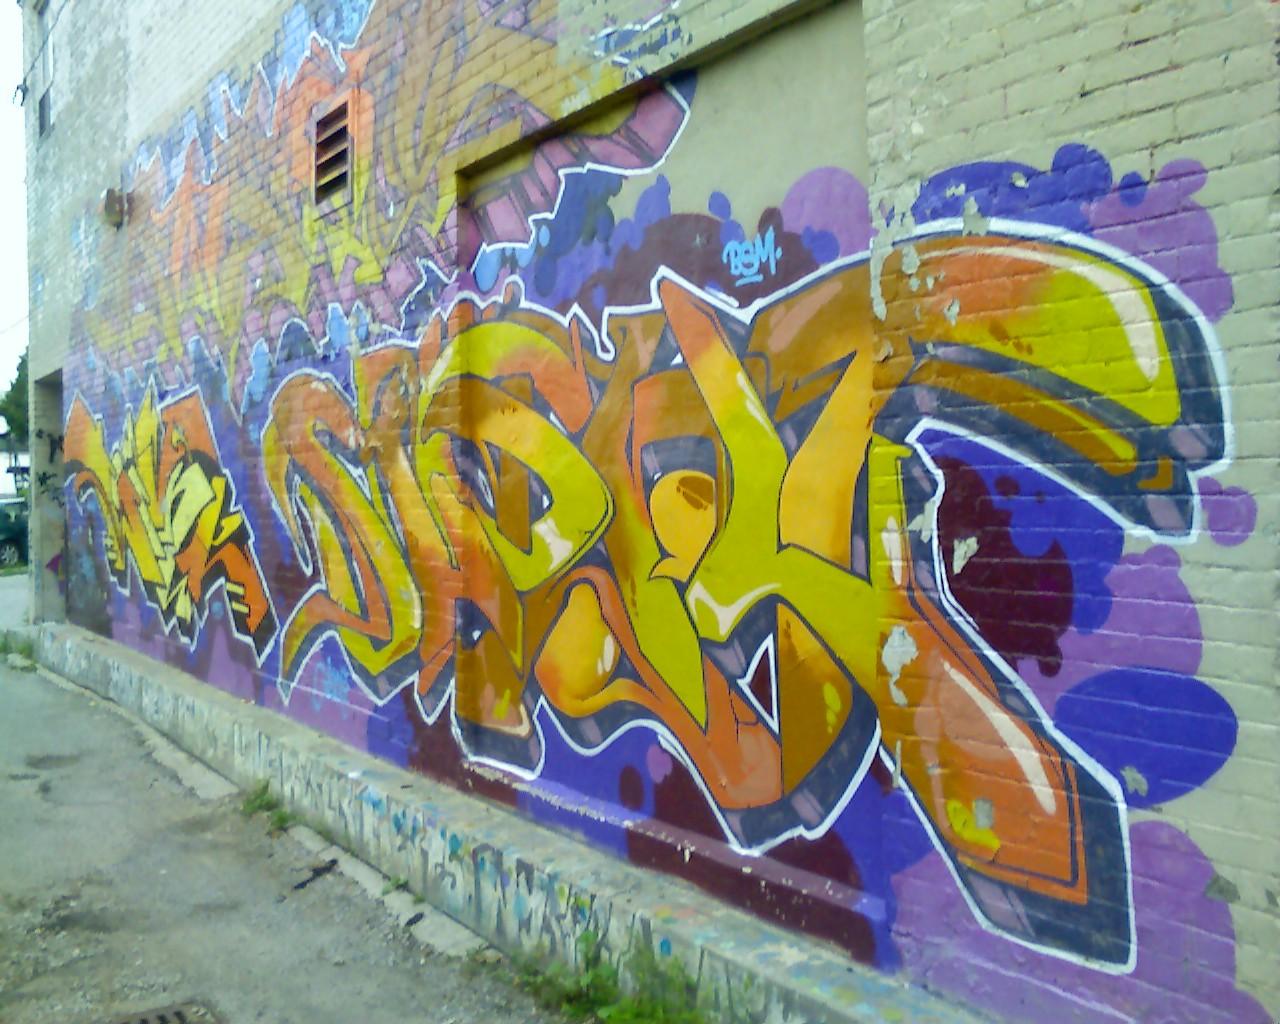 Free photo: Graffiti in Toronto - Toronto, urban, wall - Non ...